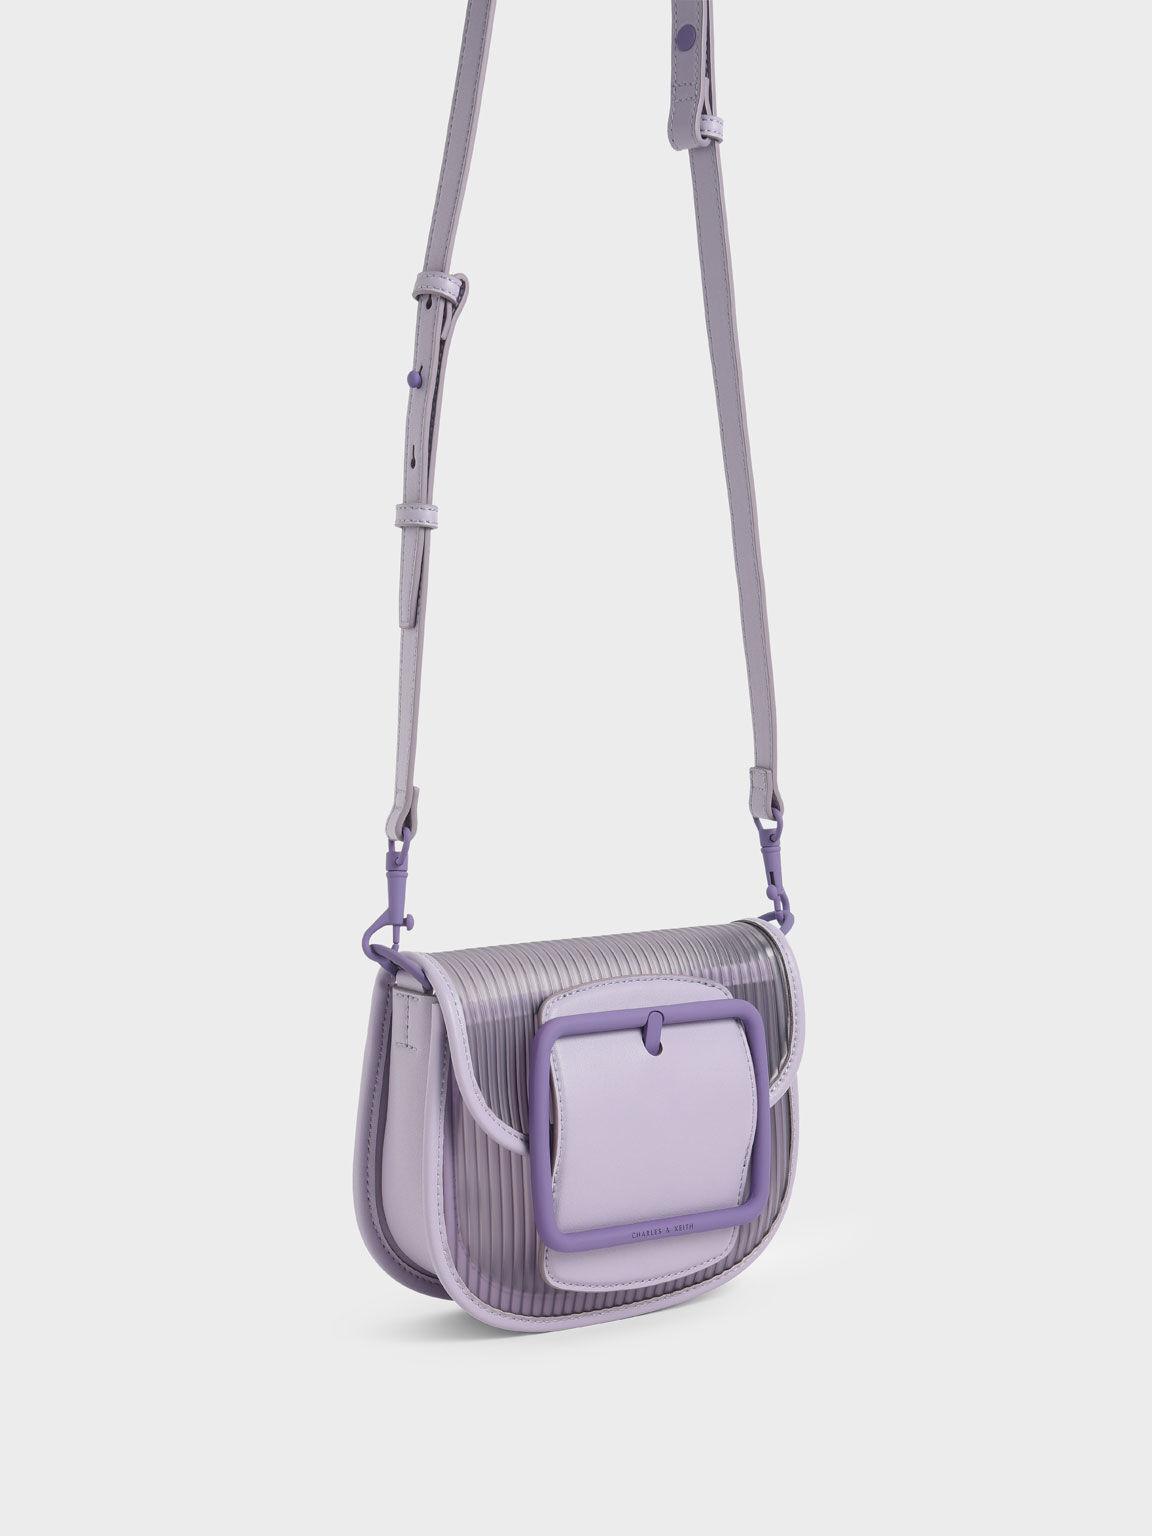 Acrylic Chain Handle Crossbody Bag, Lilac, hi-res